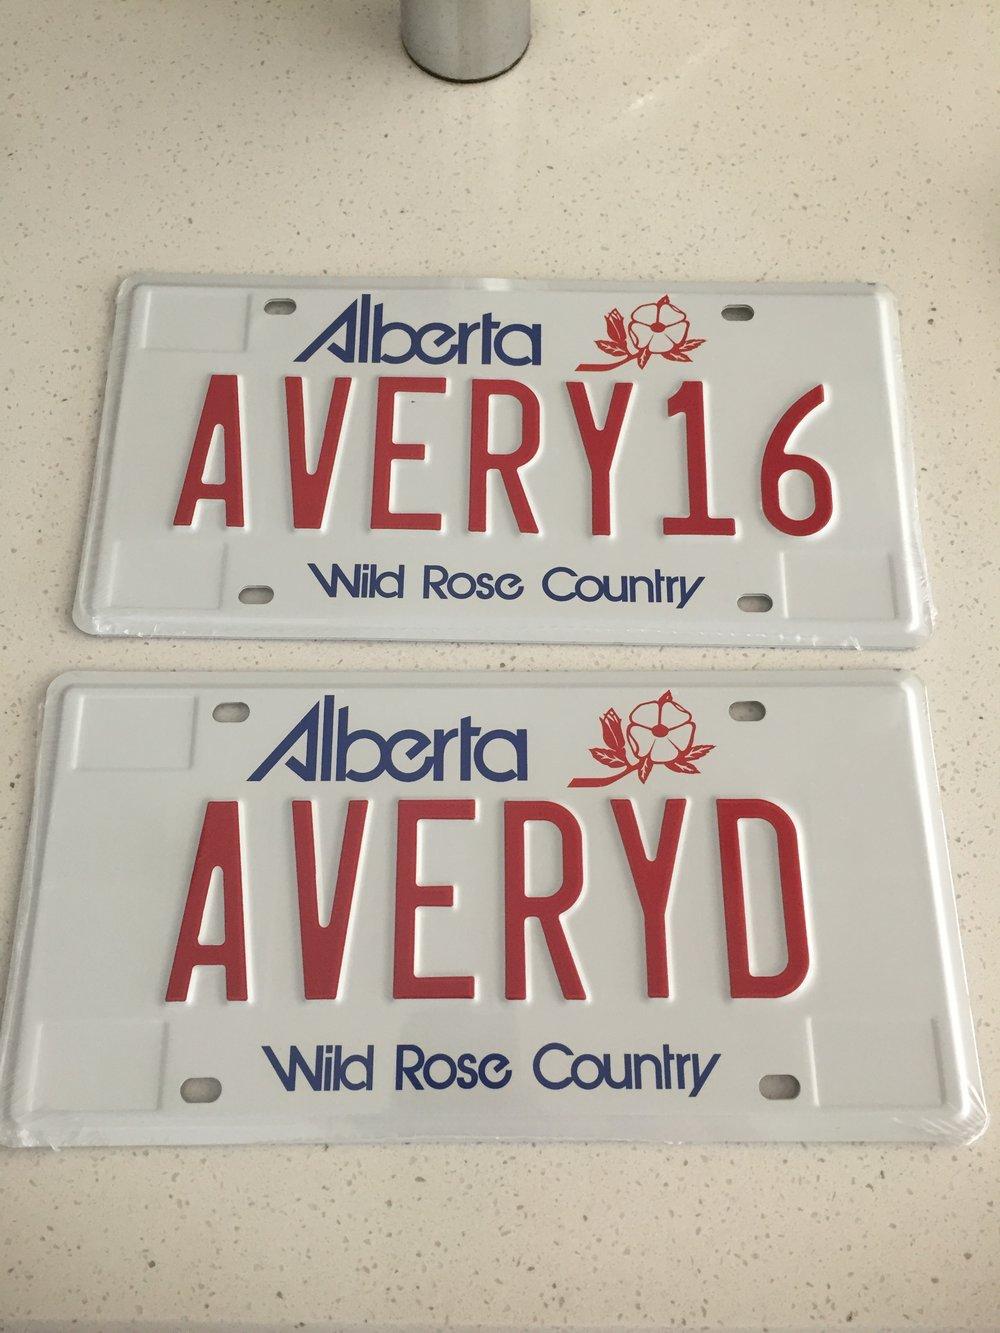 Avery plates.JPG